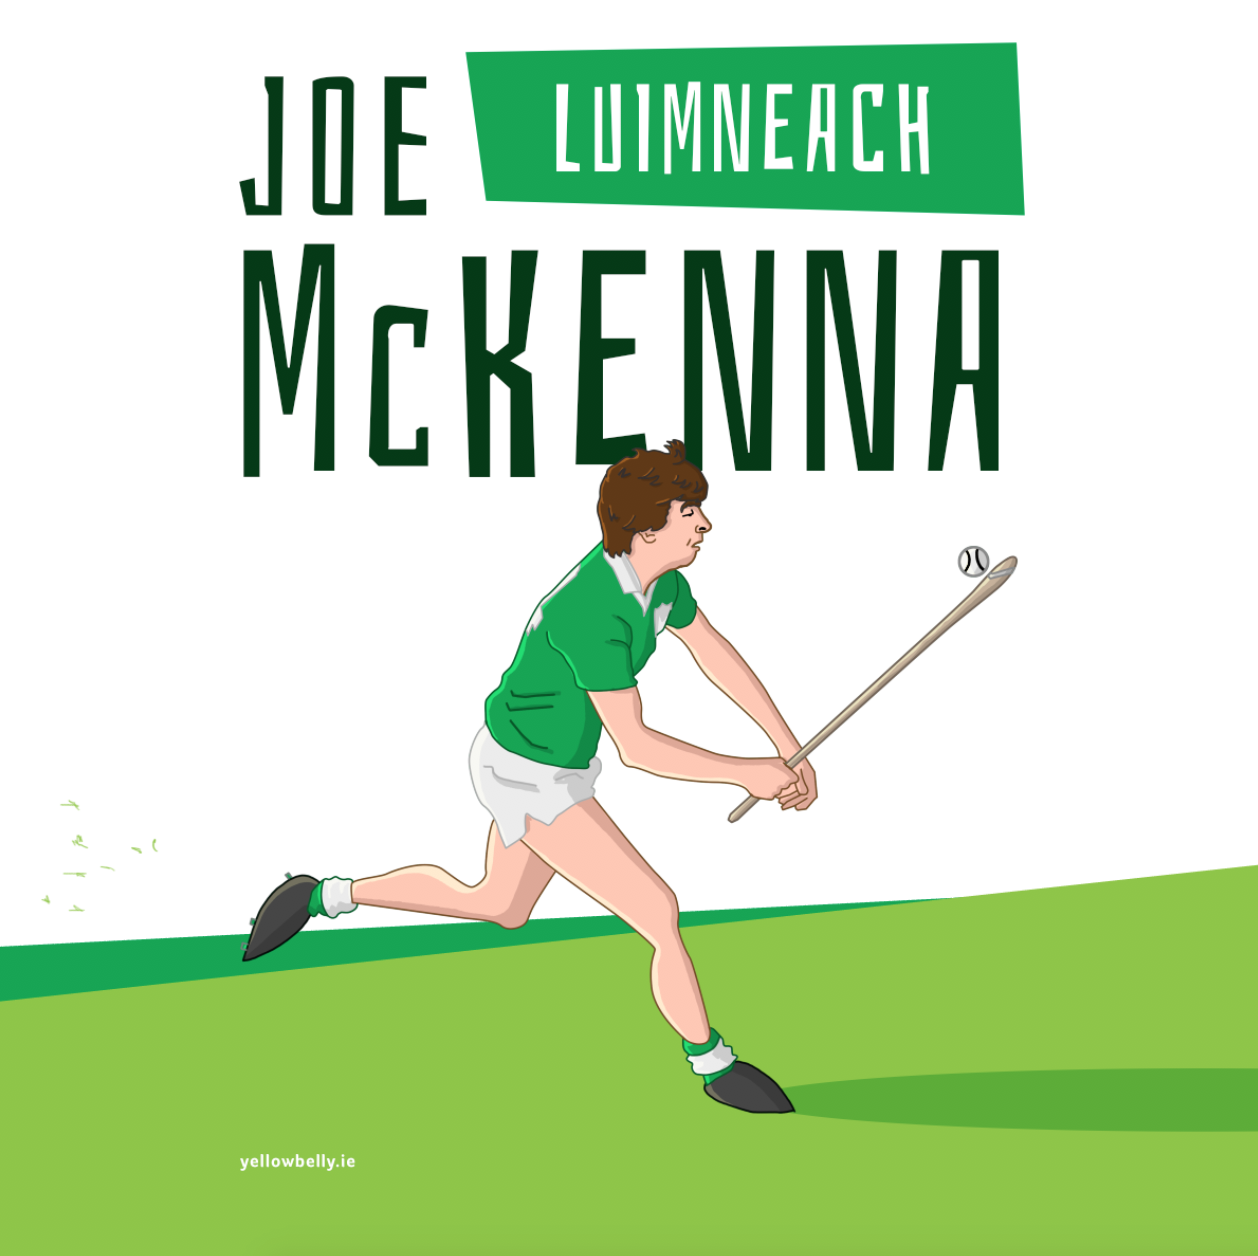 Joe Mckenna Limerick Hurling Sport Gaa Illustration Artwork Poster Munster Croke Park Yellowbelly Croke Park Sport Illustration Mckenna